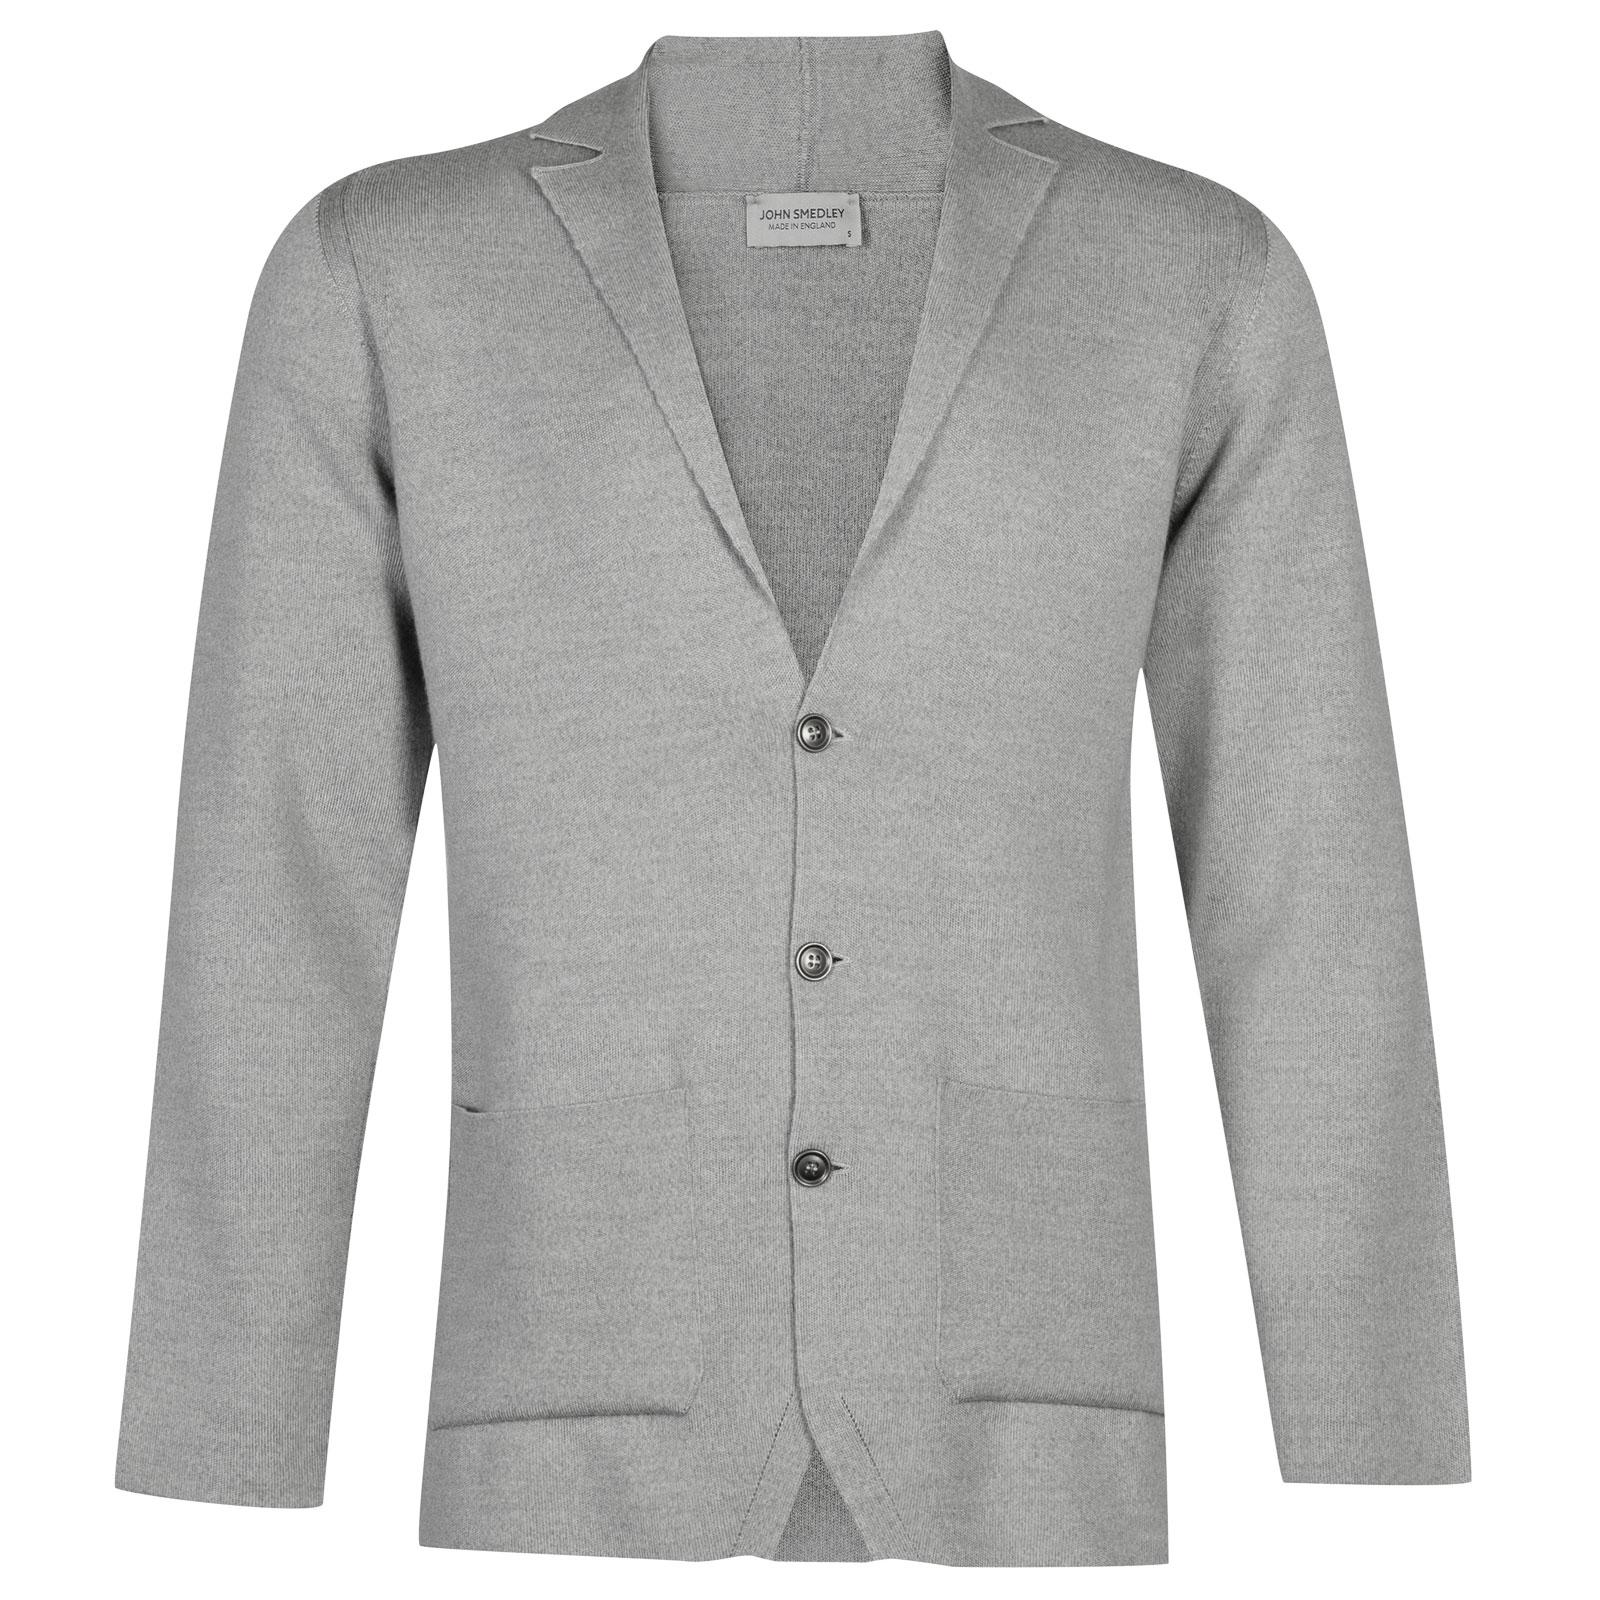 John Smedley Oxland Merino Wool Jacket in Bardot Grey-S